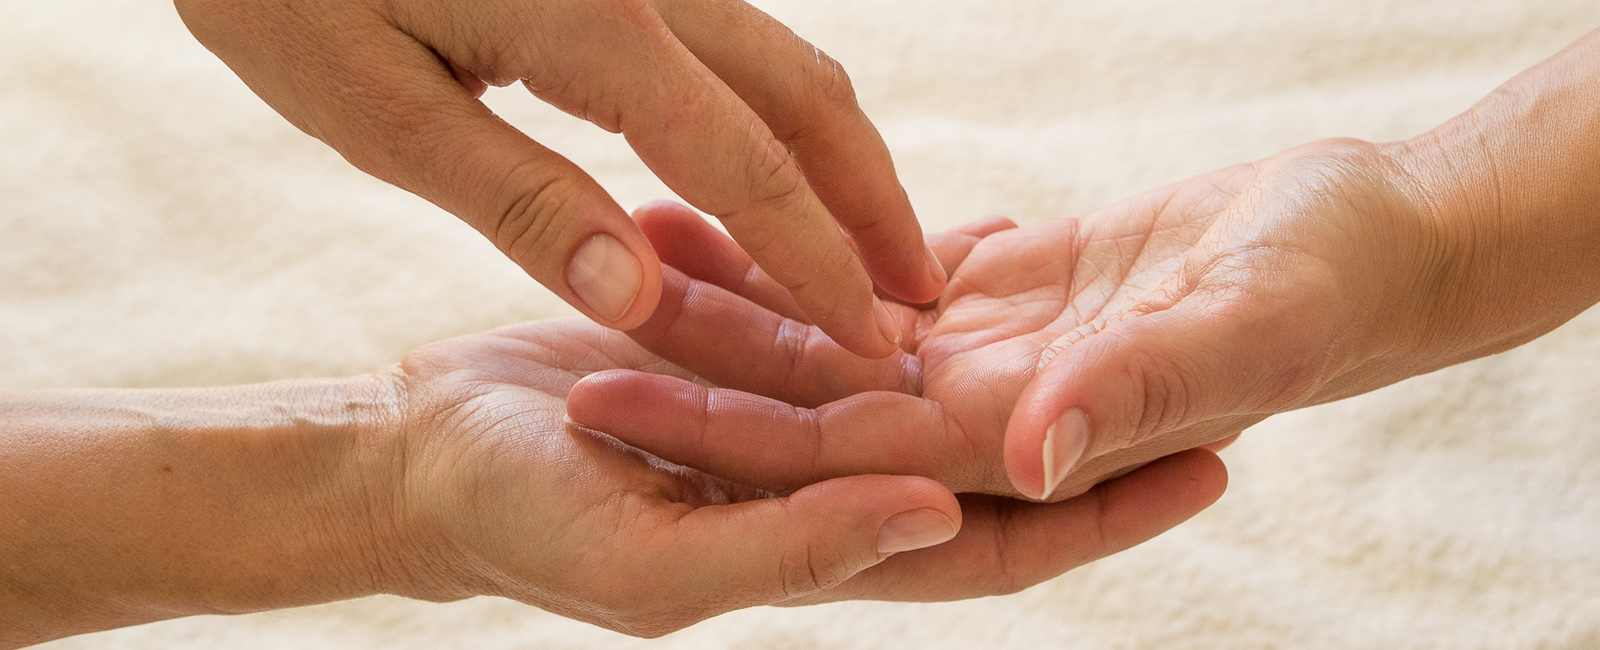 toucher massage main